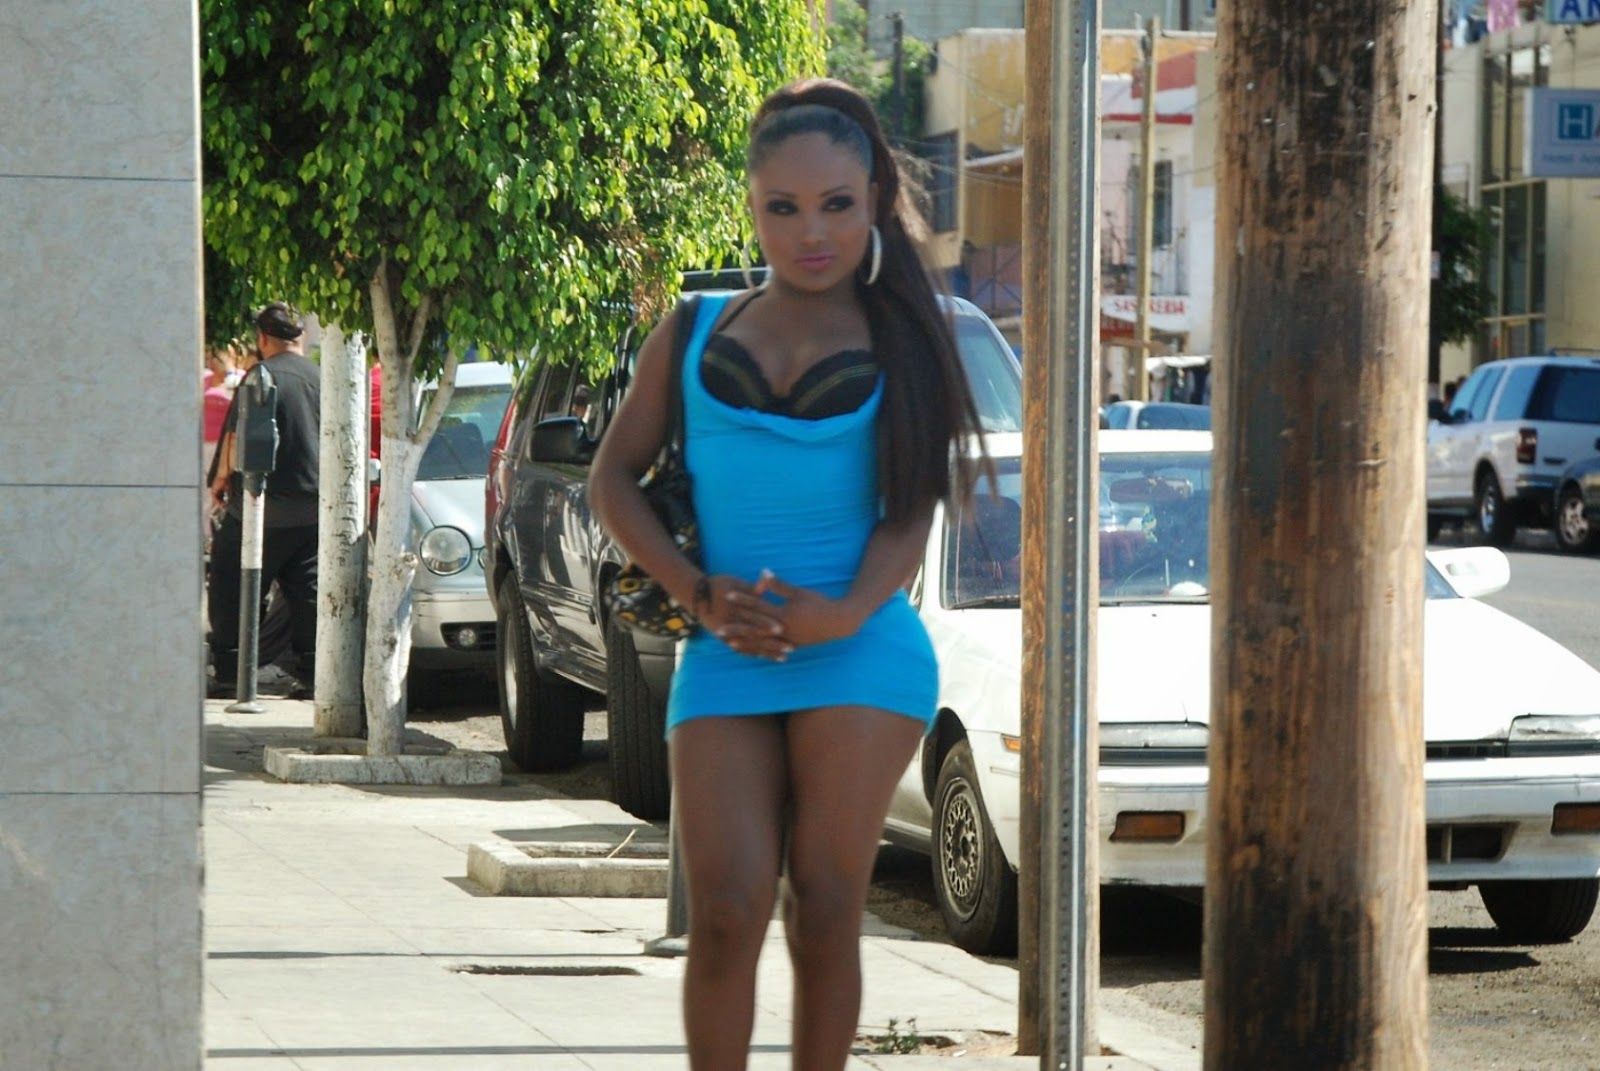 prostitutas hombres vestidos de prosti